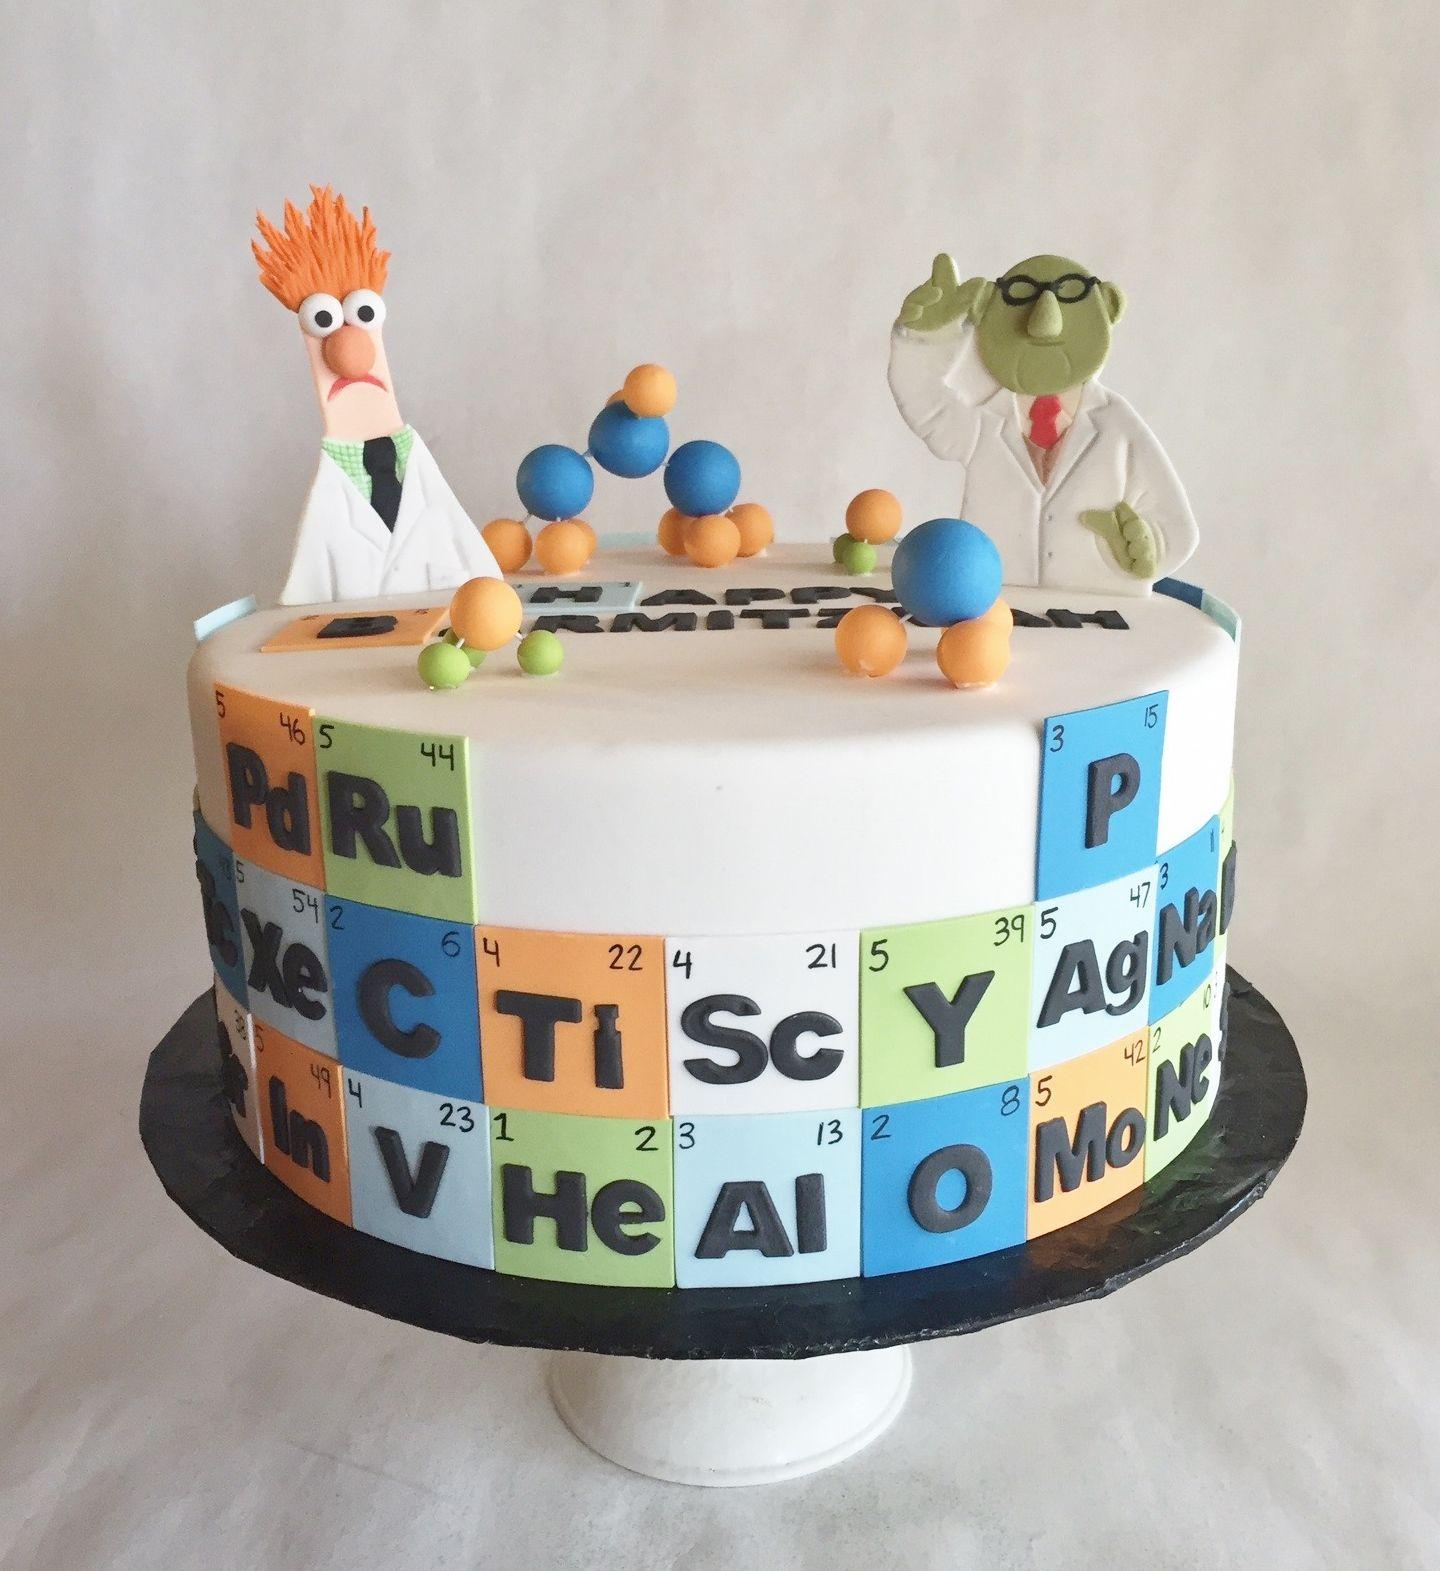 Barmitzvah cake birthday cake chemistry muppets beaker barmitzvah cake birthday cake chemistry muppets beaker bunsen fondant gamestrikefo Choice Image